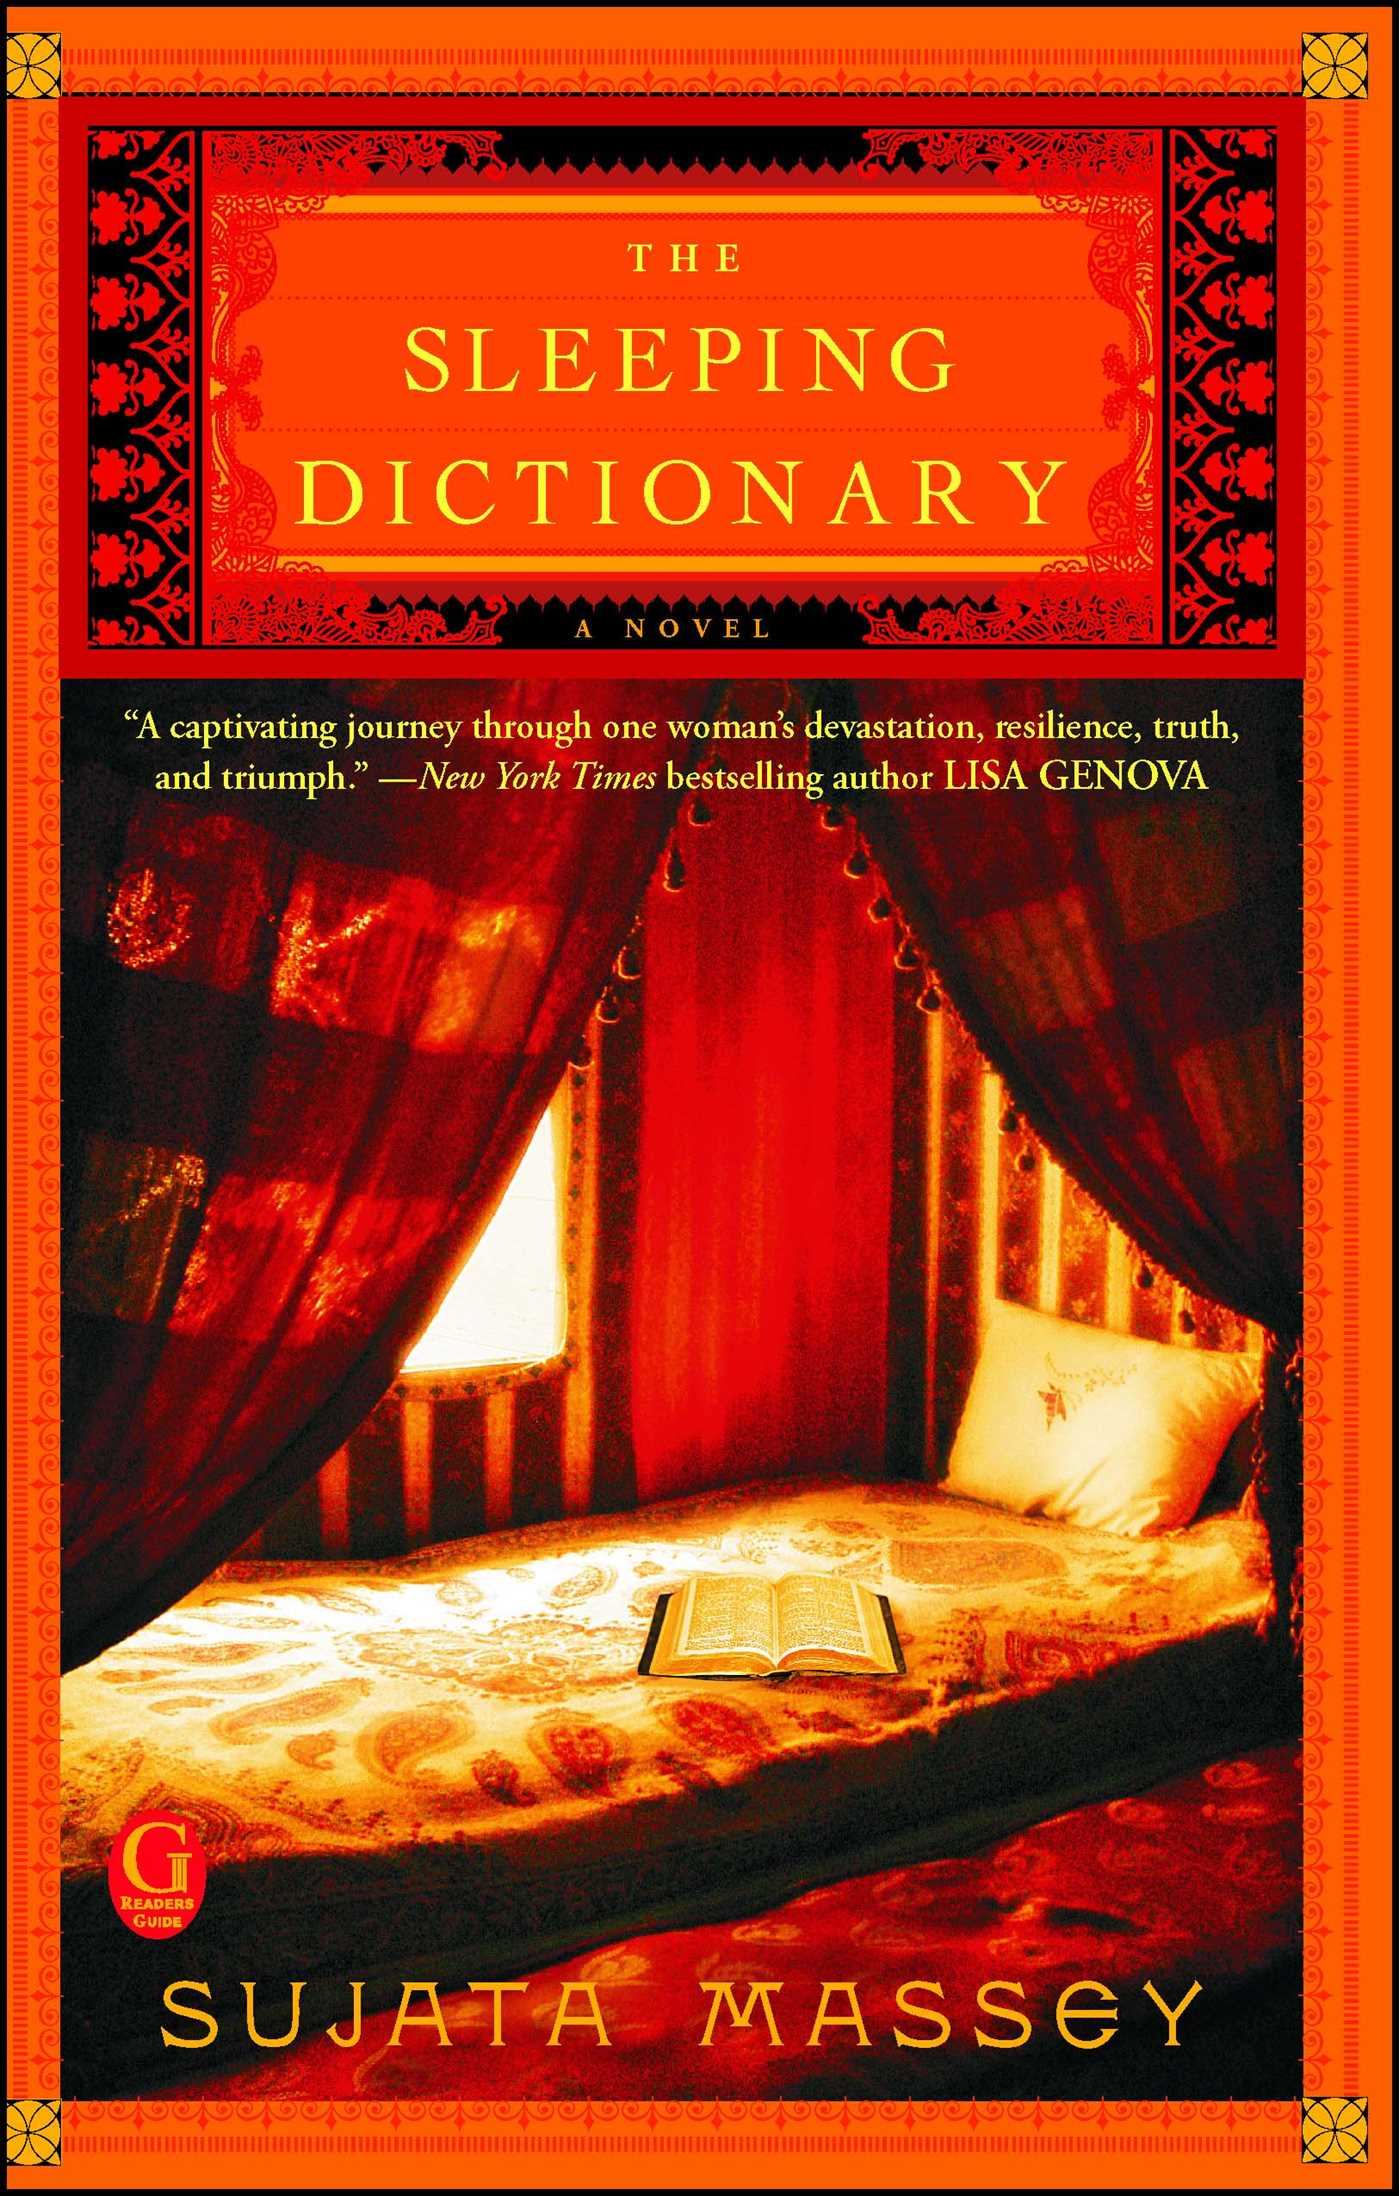 The sleeping dictionary 9781476703251 hr